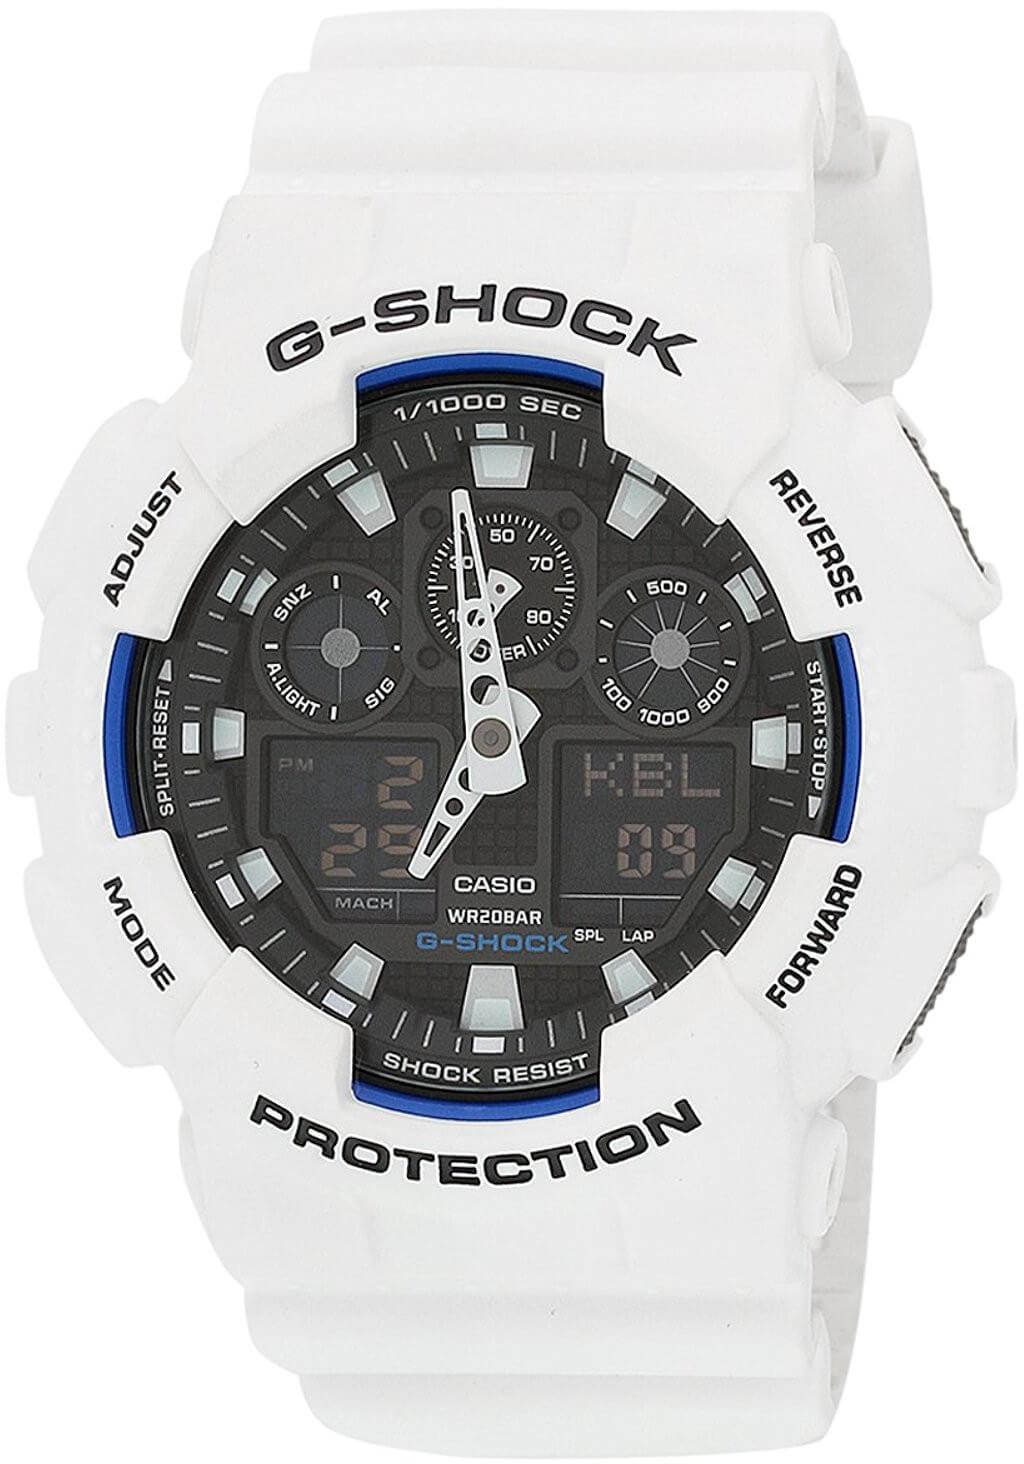 Casio The G G-SHOCK GA 100B-7A Doprava ZDARMA  f0cda16571b